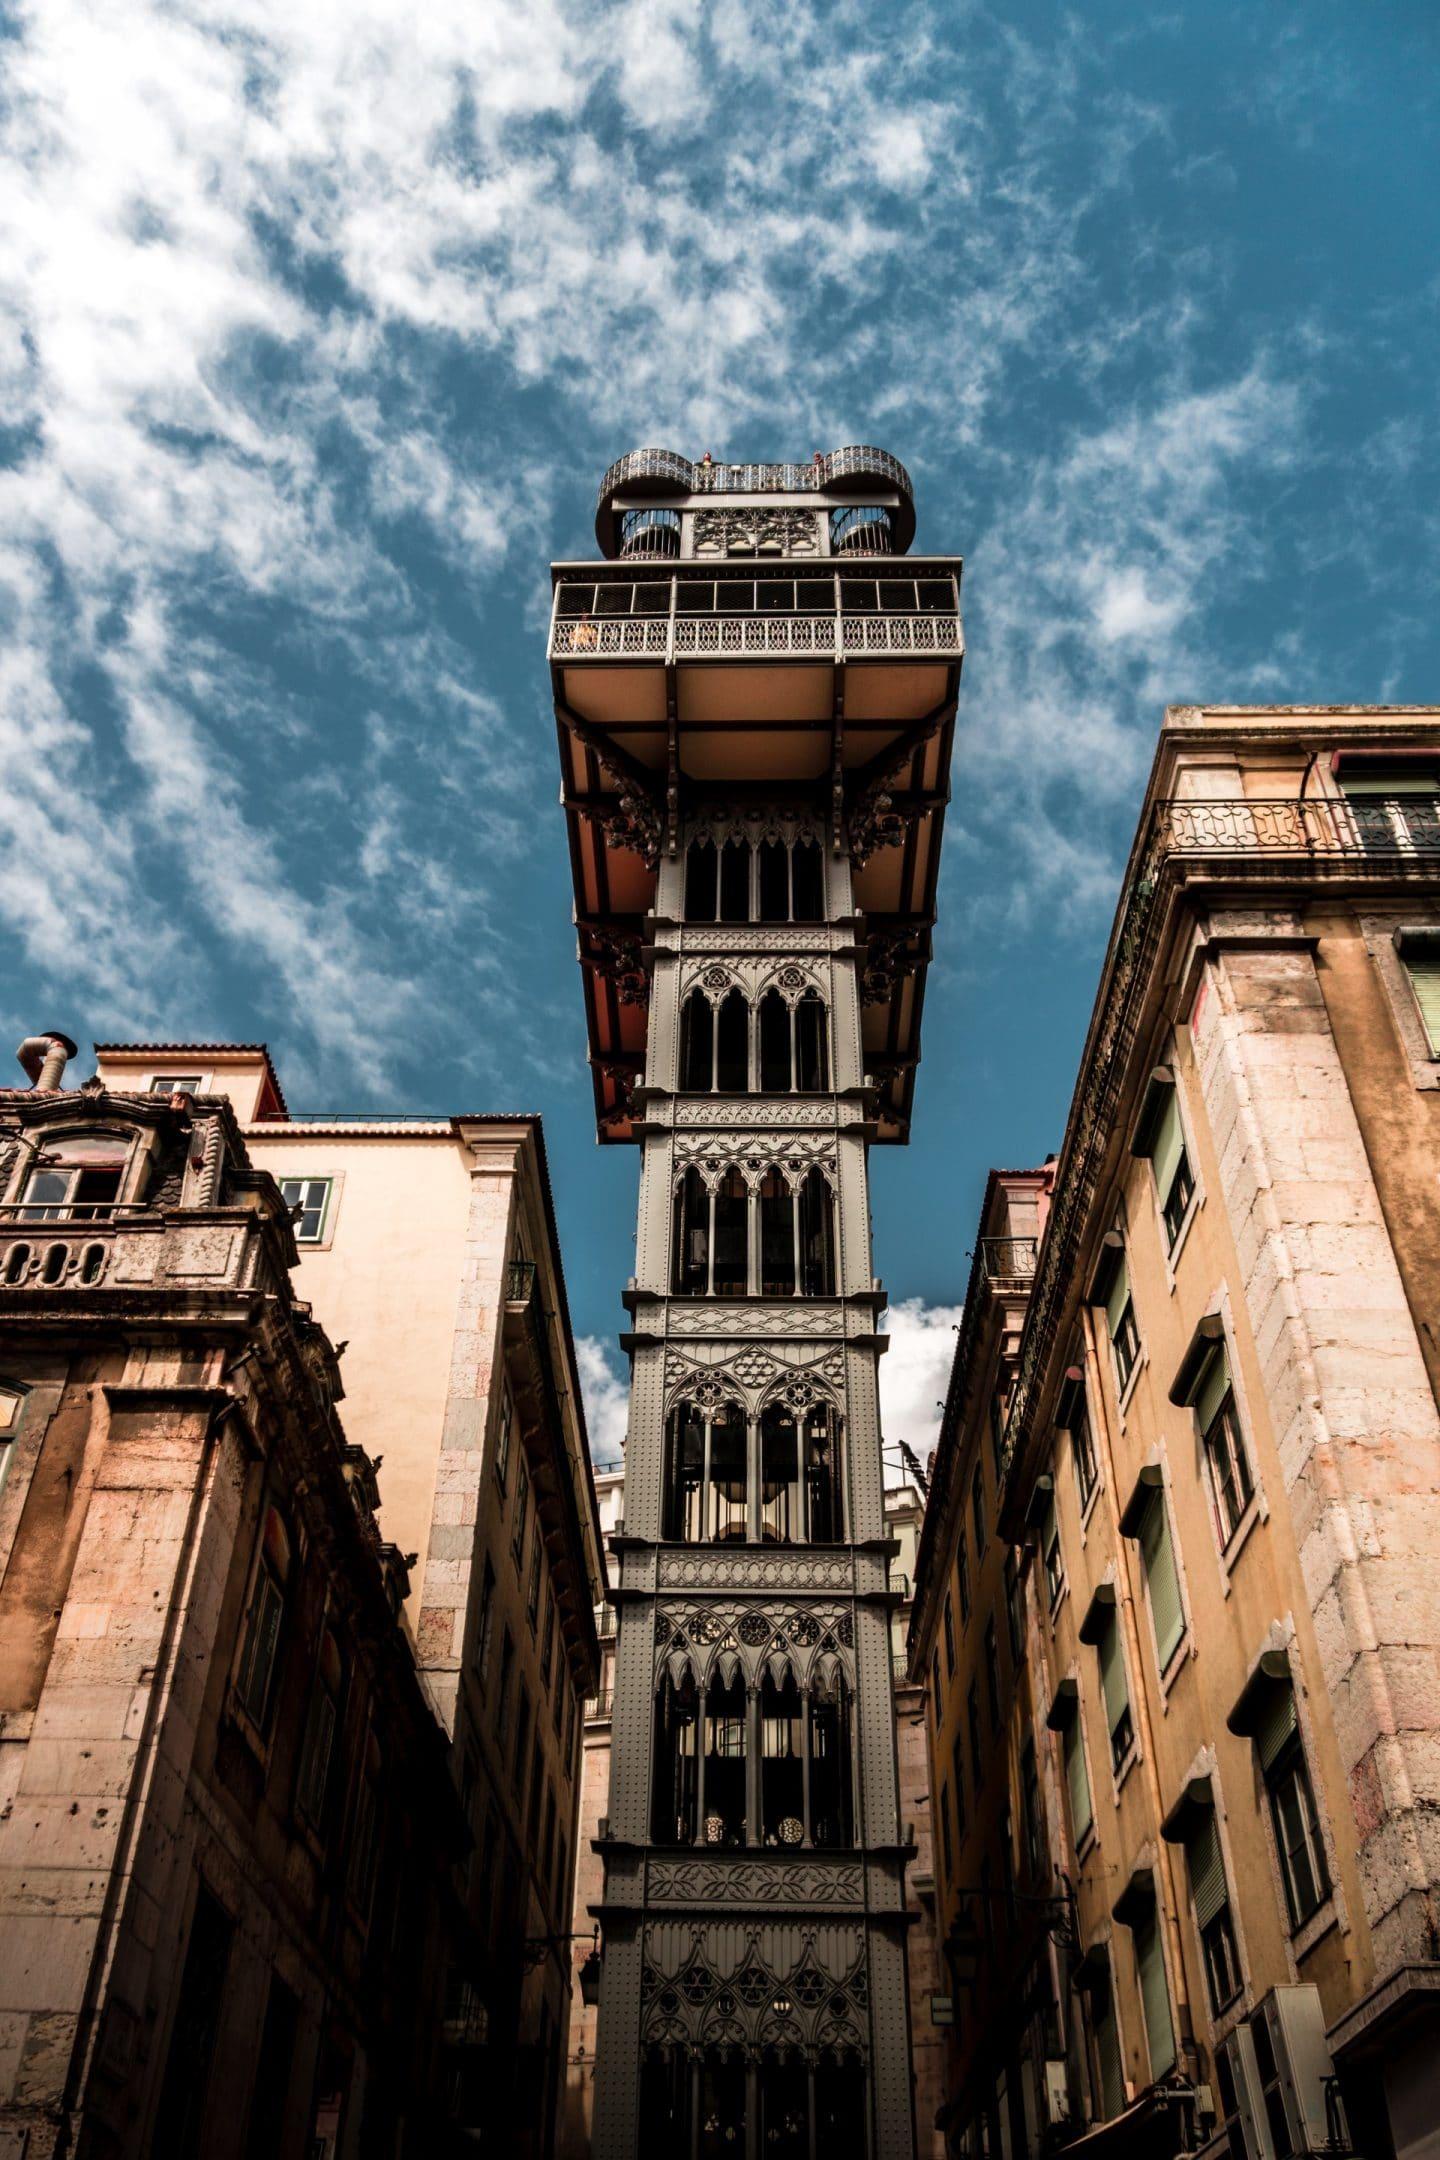 vista do elevador de santa justa a partir da rua do ouro